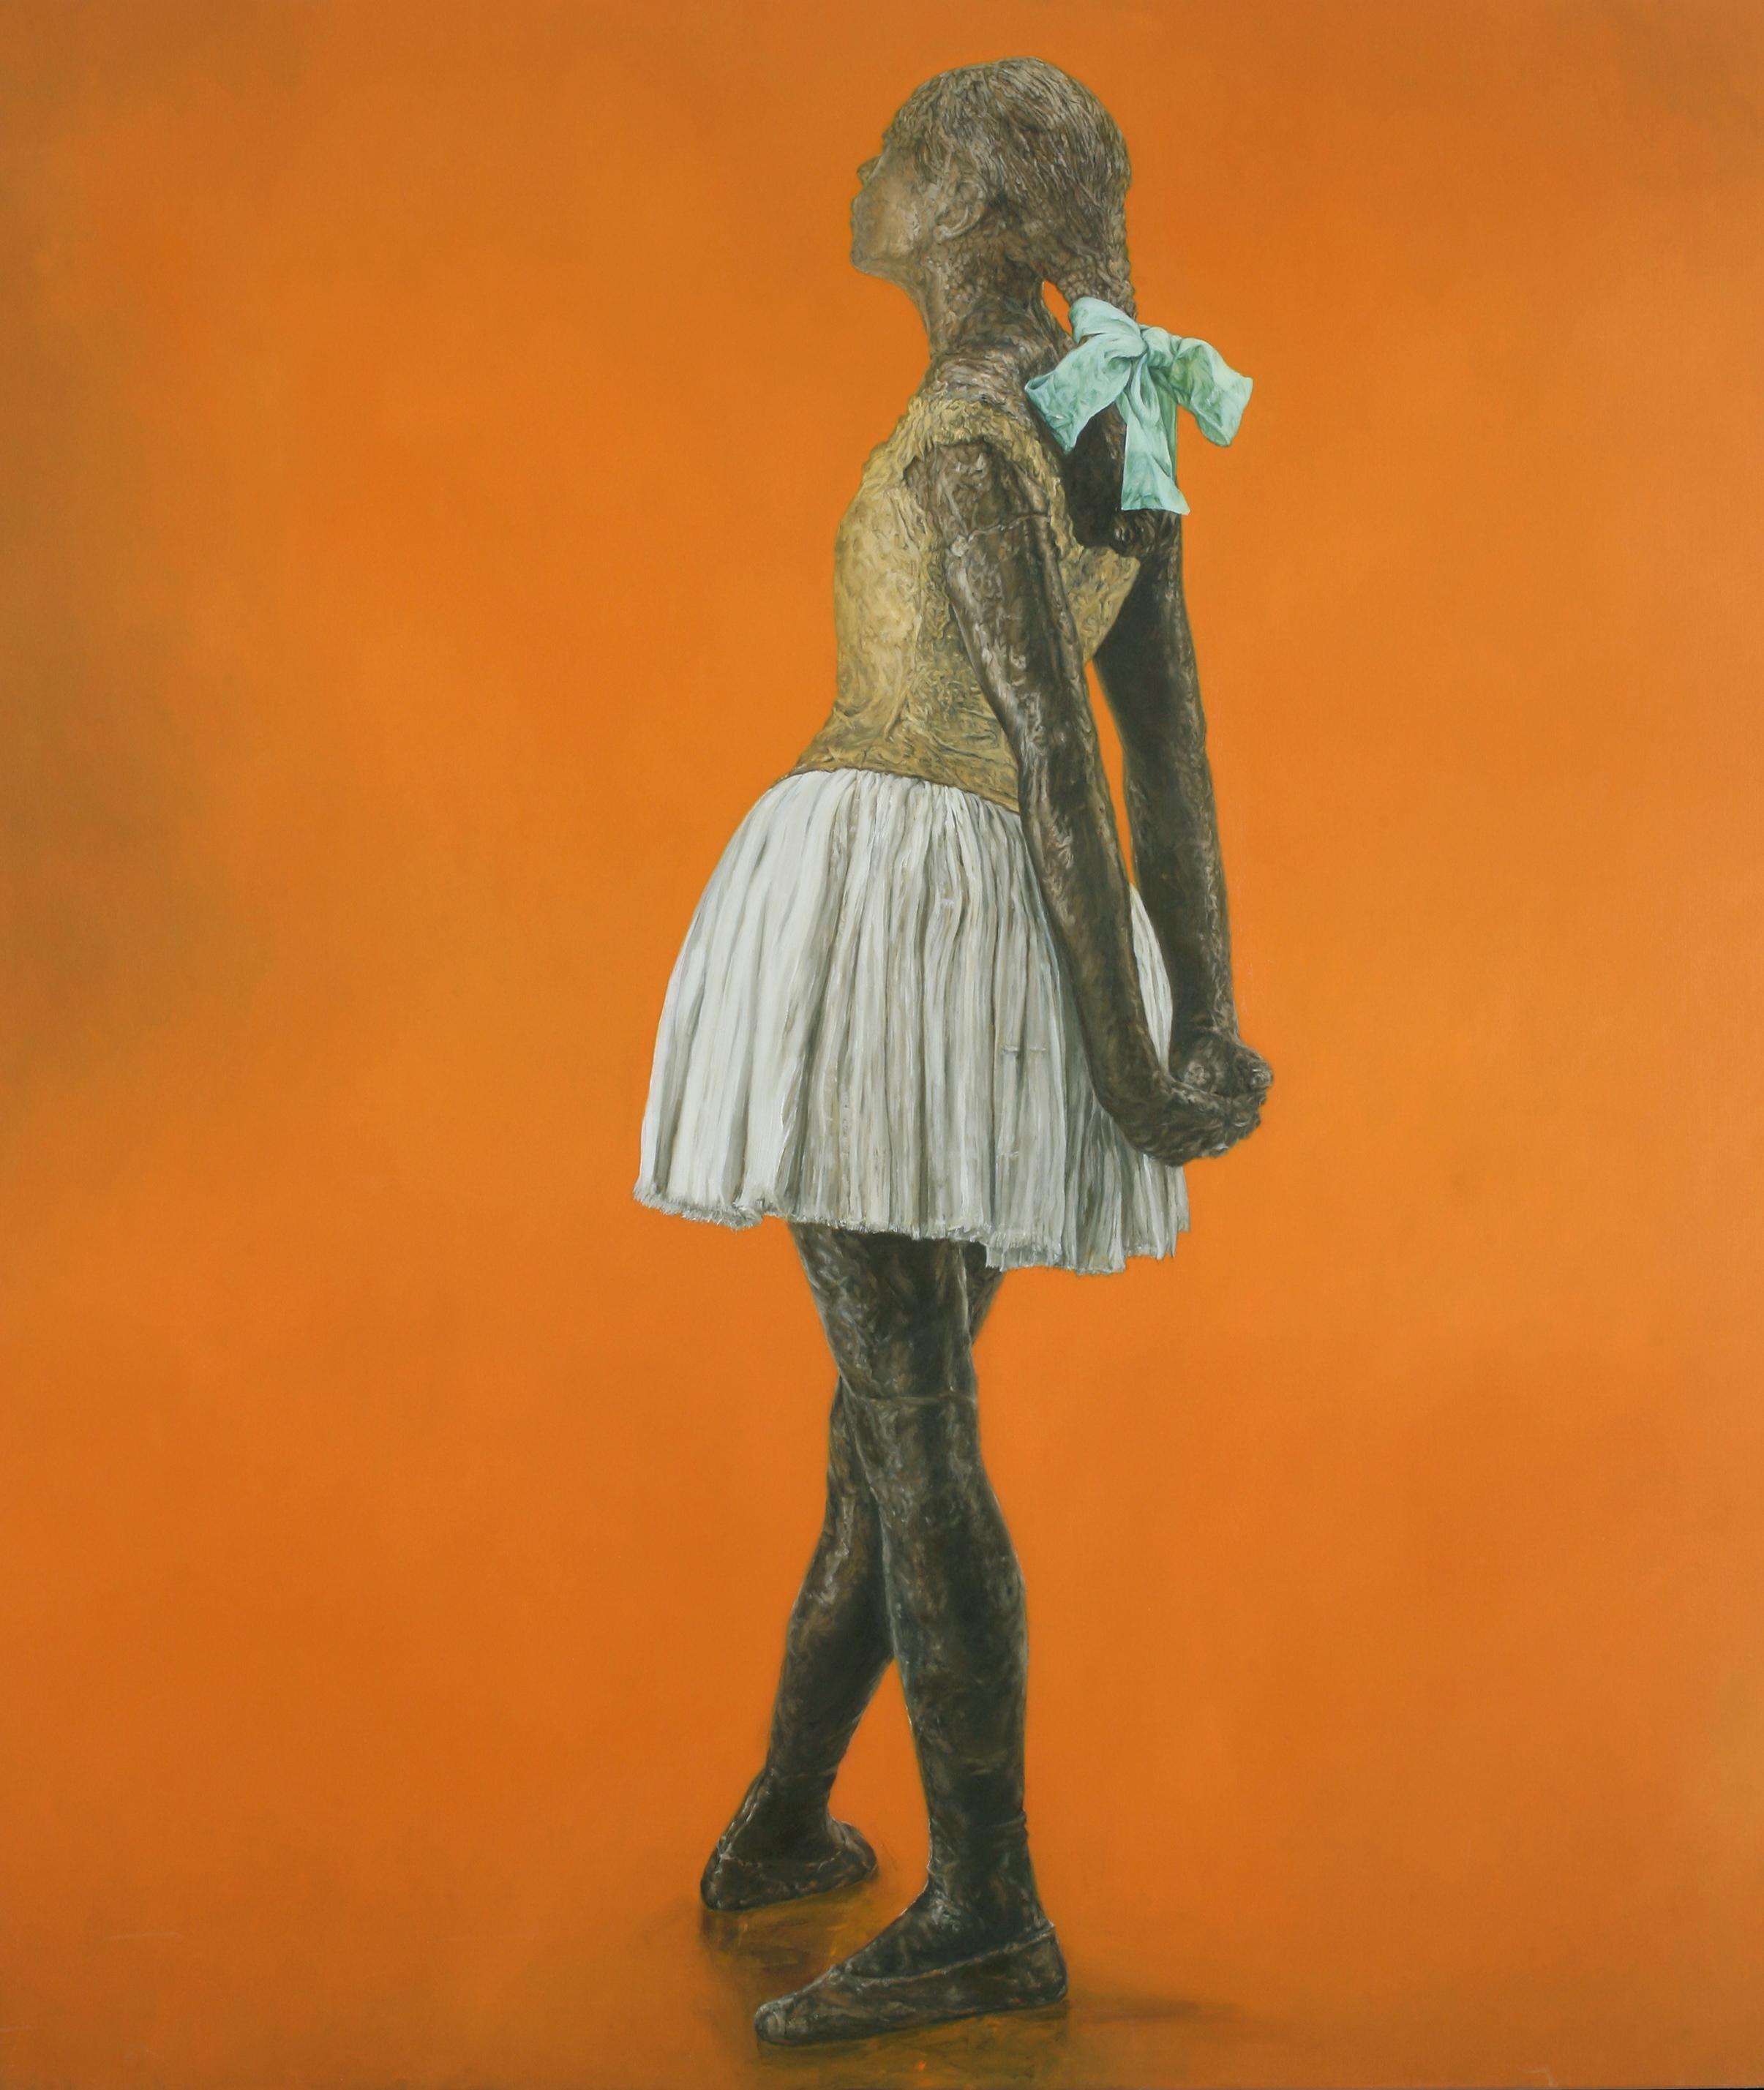 Little Fourteen-Year-Old Dancer on Tangerine